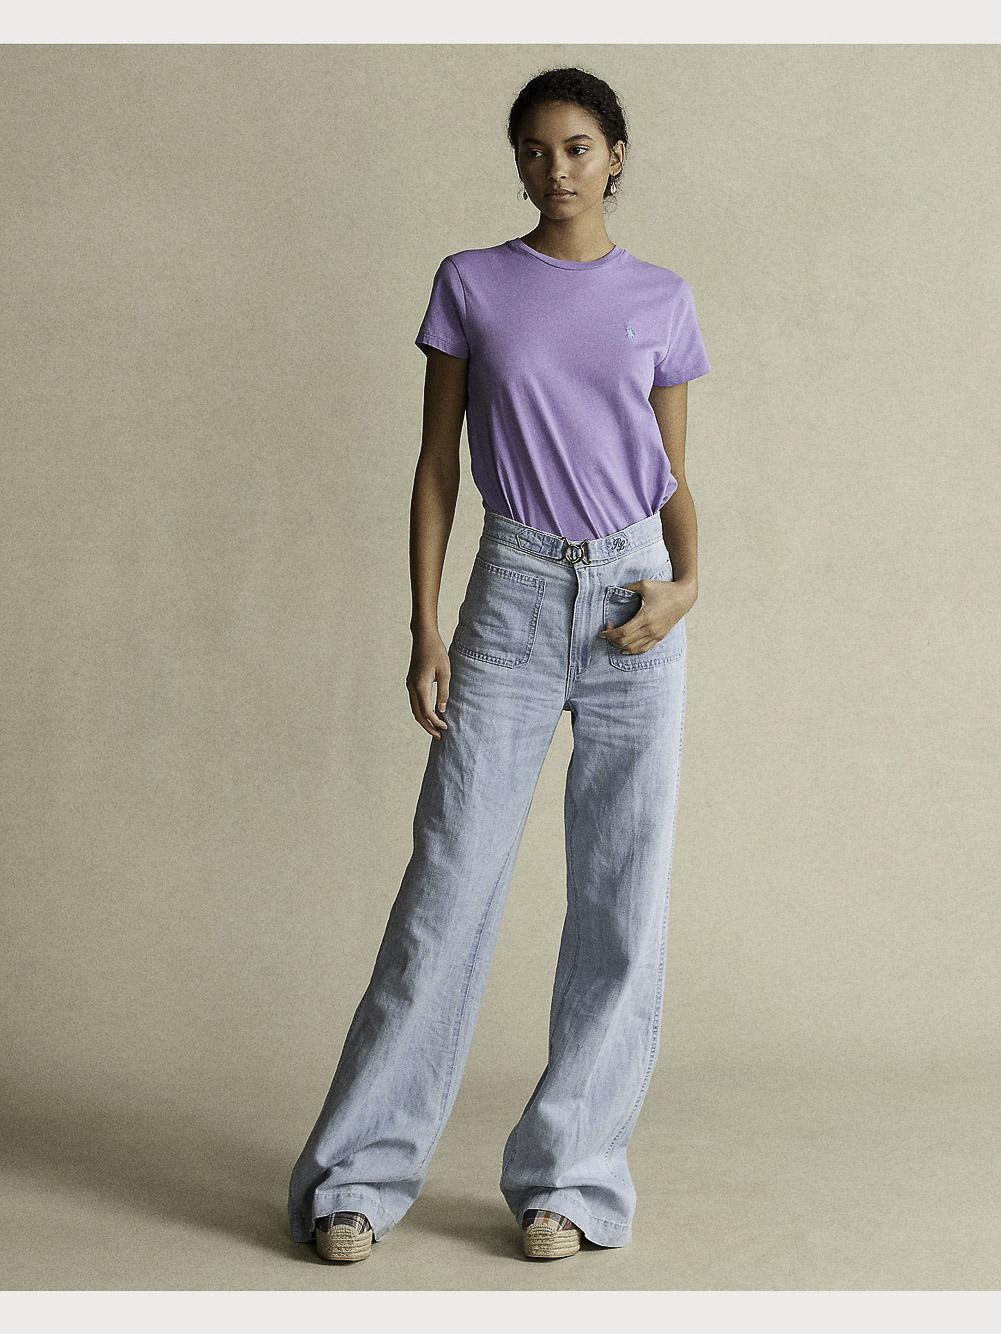 POLO RALPH LAUREN Μπλούζα T-Shirt 211734144046 ΜΩΒ